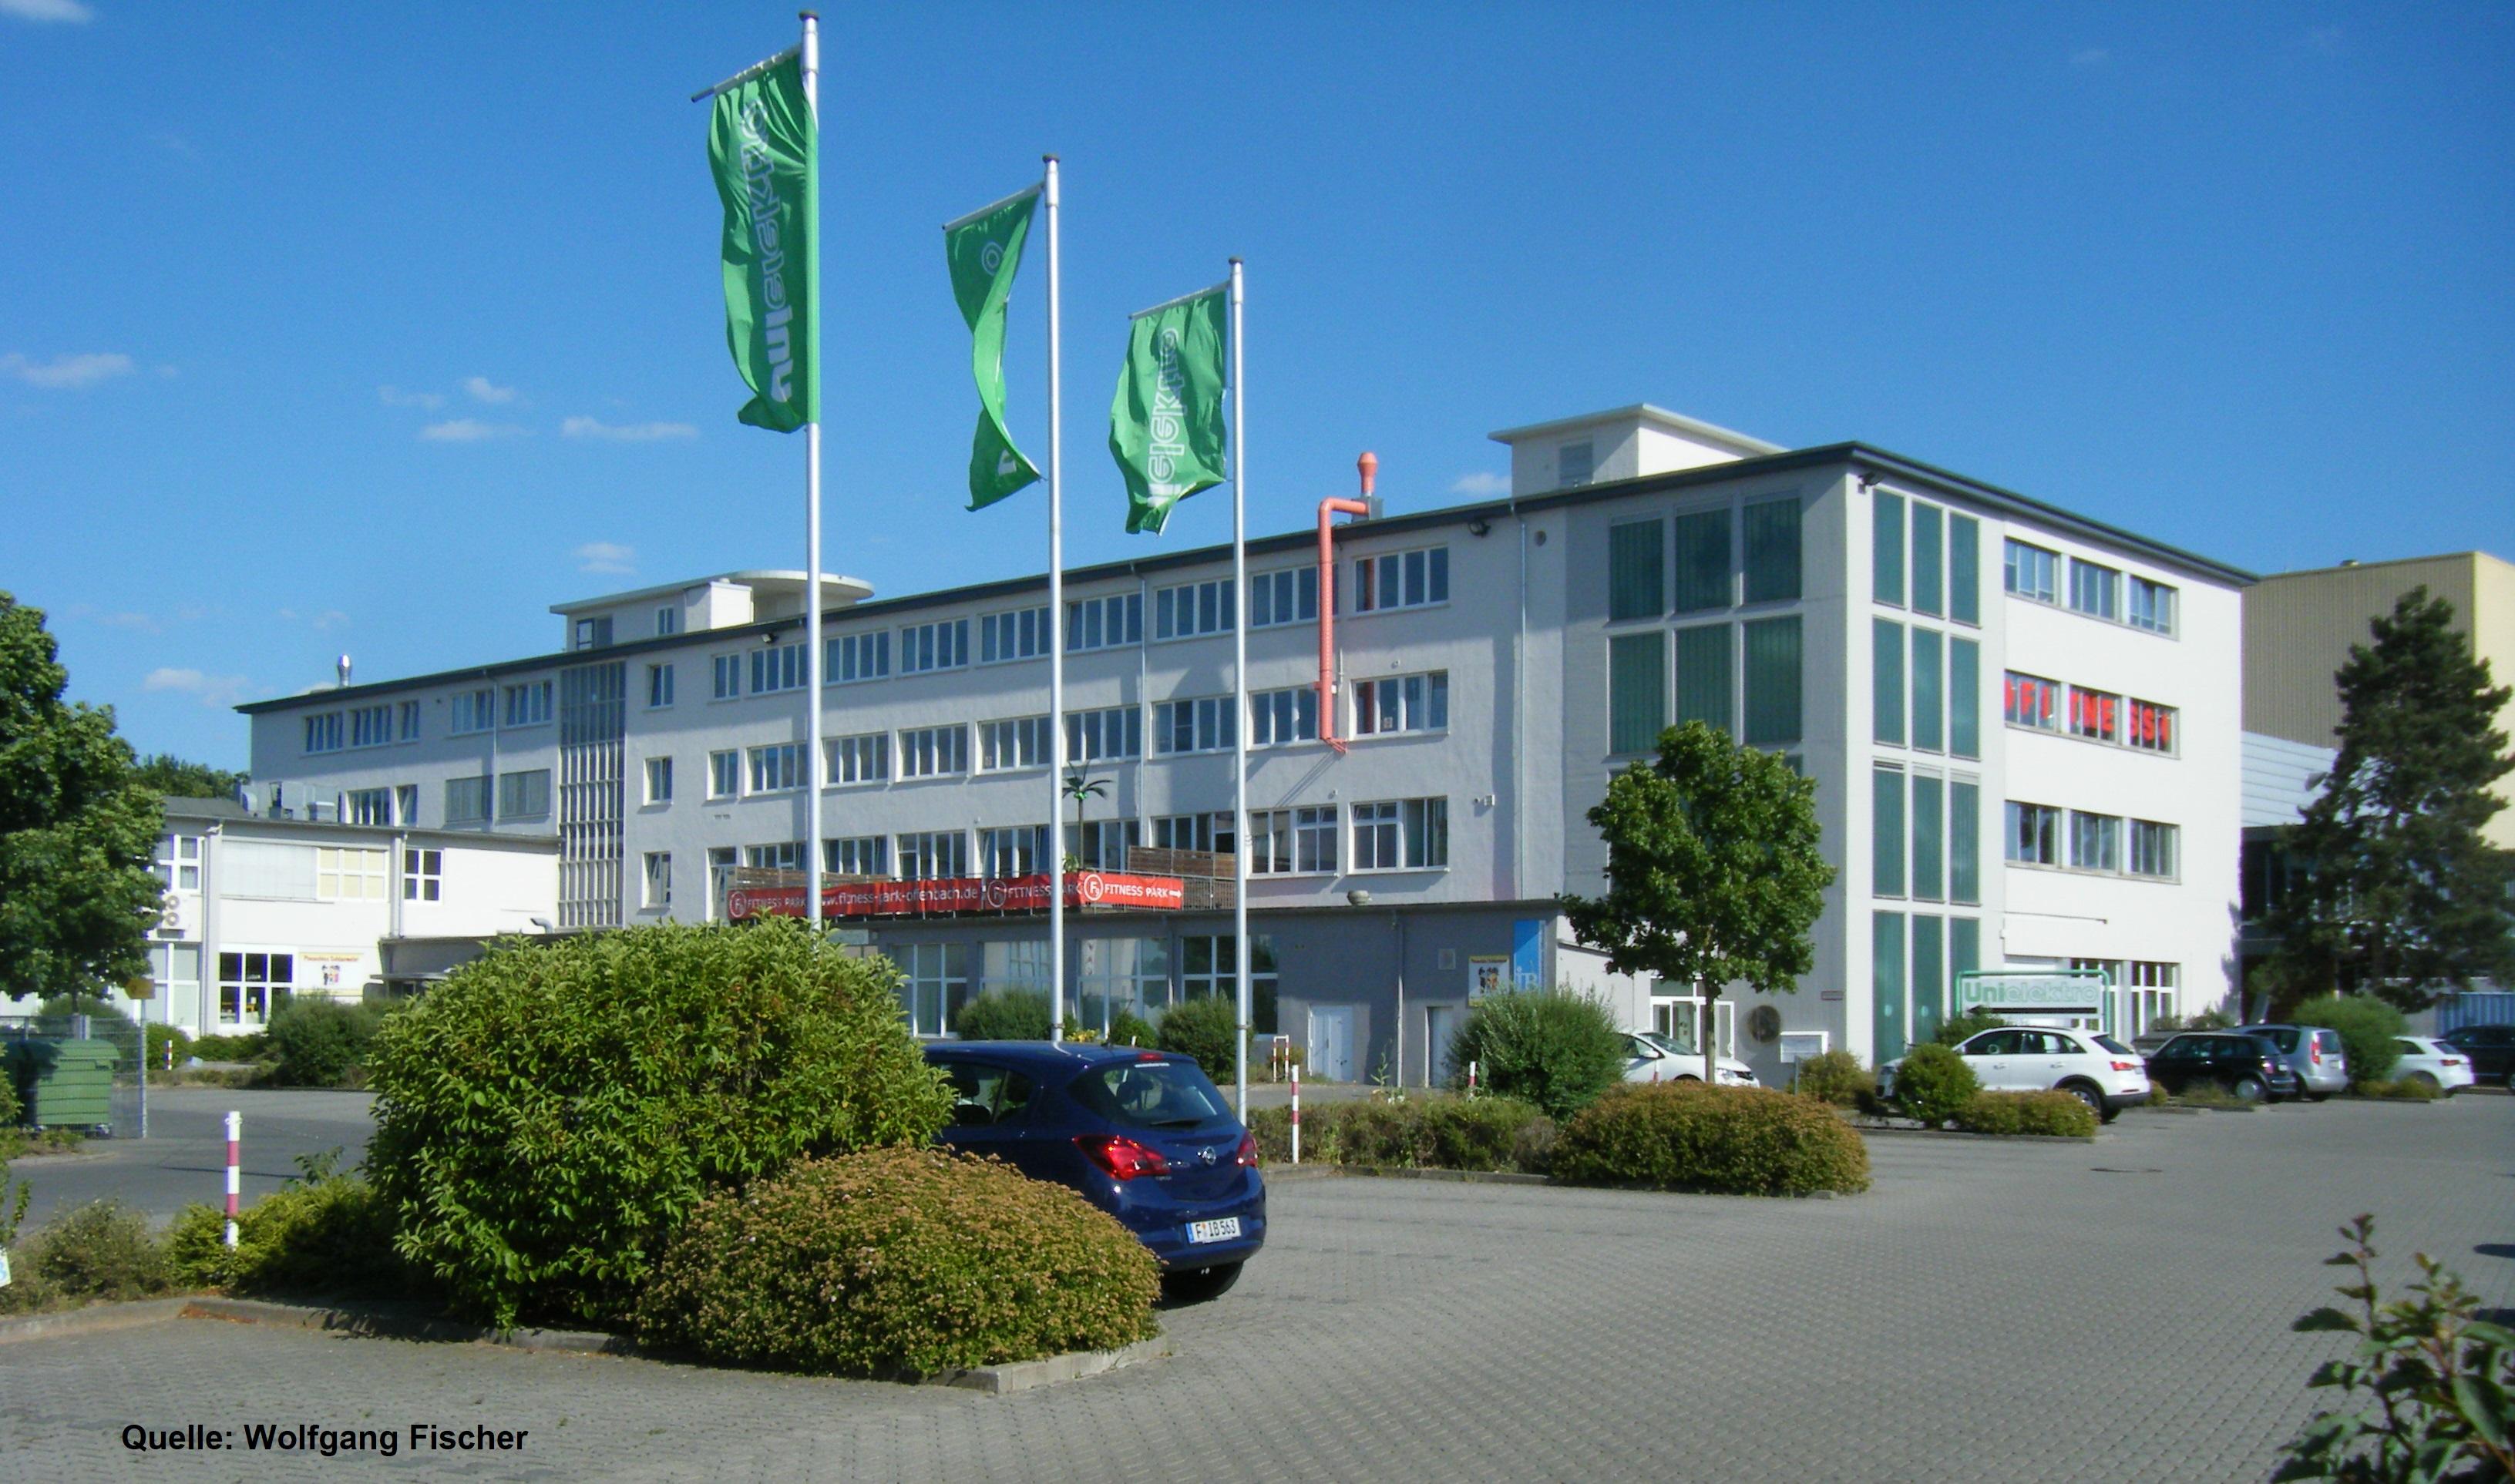 Diskriminierung in Offenbacher Fitnessstudio: Fristlose Kündigung wegen Schuppenflechte